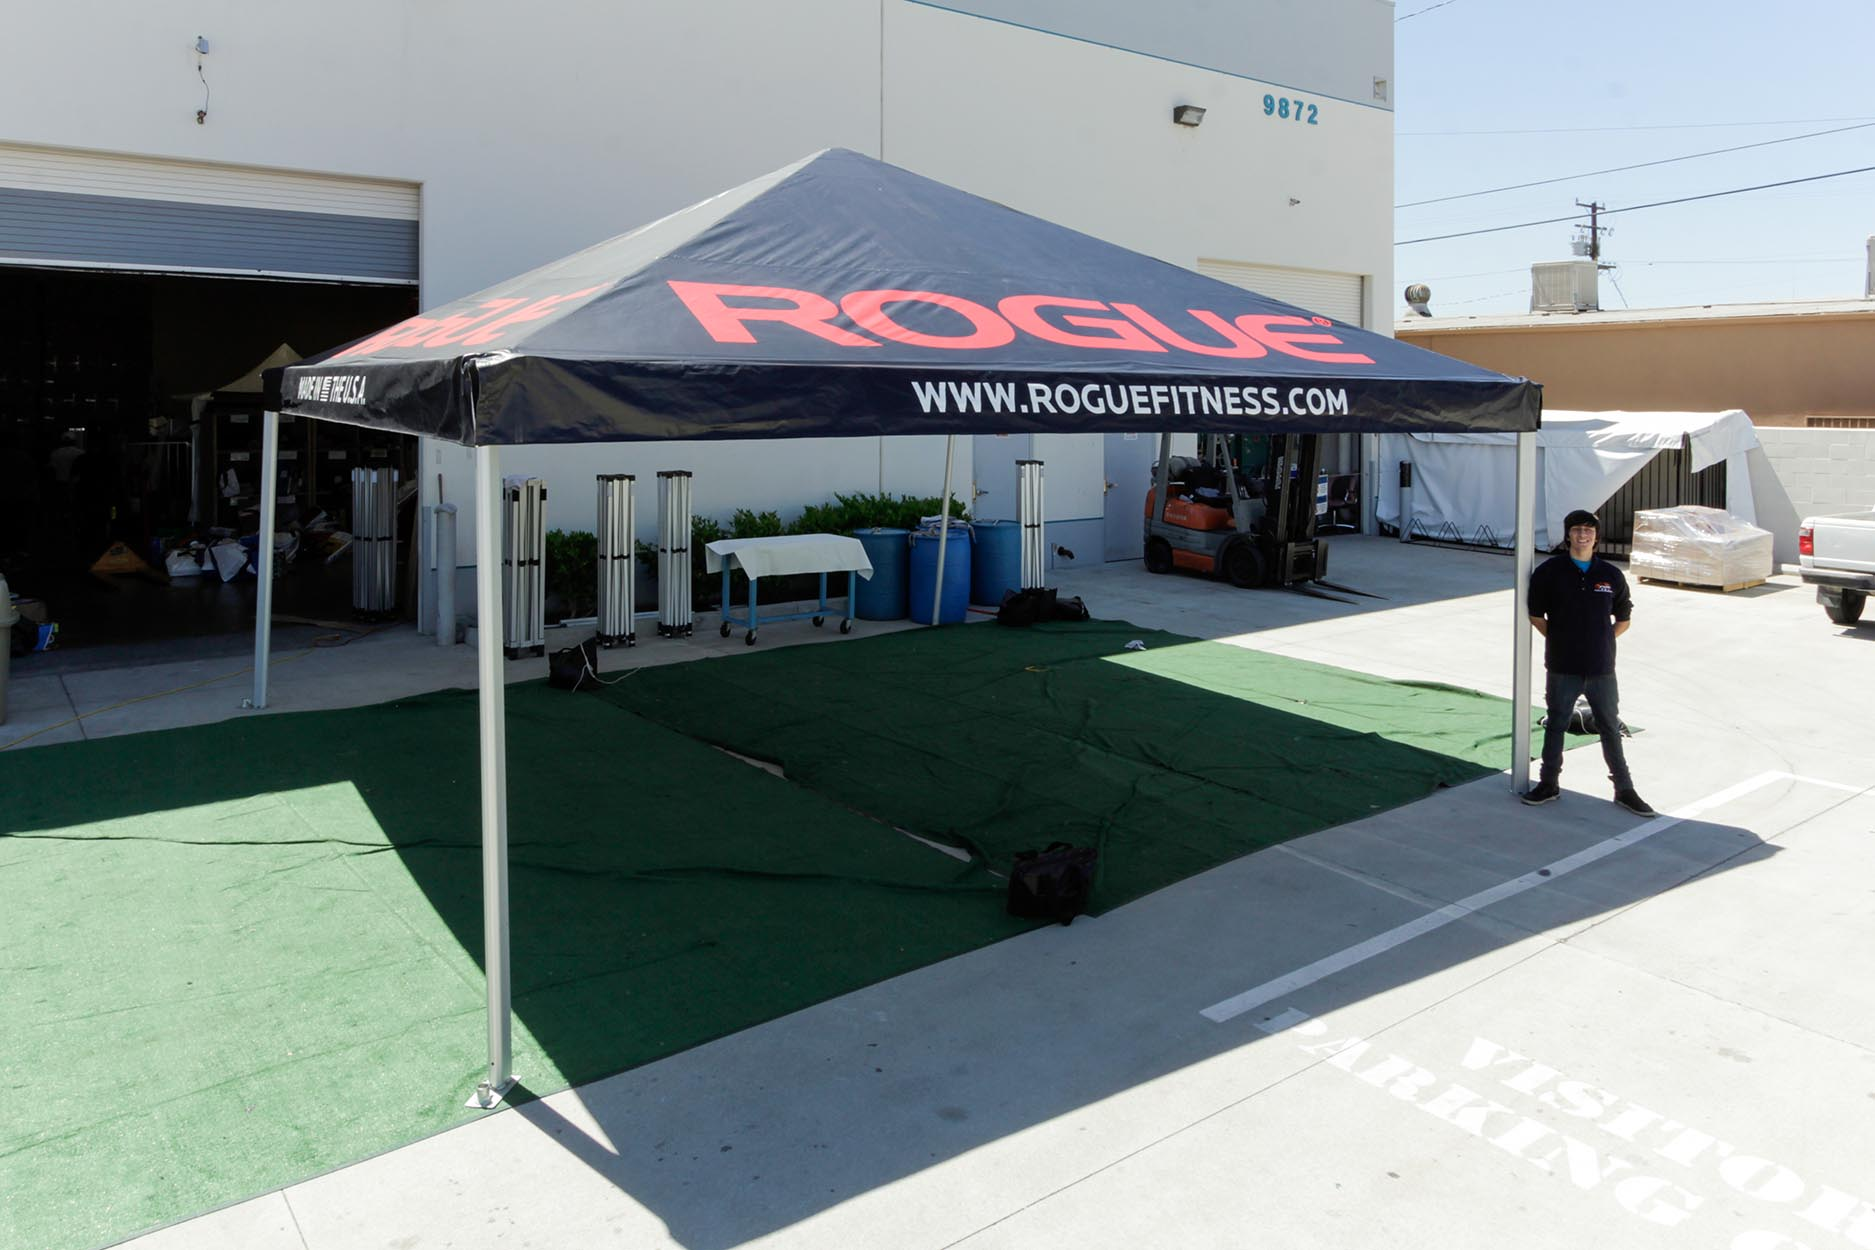 Rogue Fitness 20x20 Standard Frame Tent